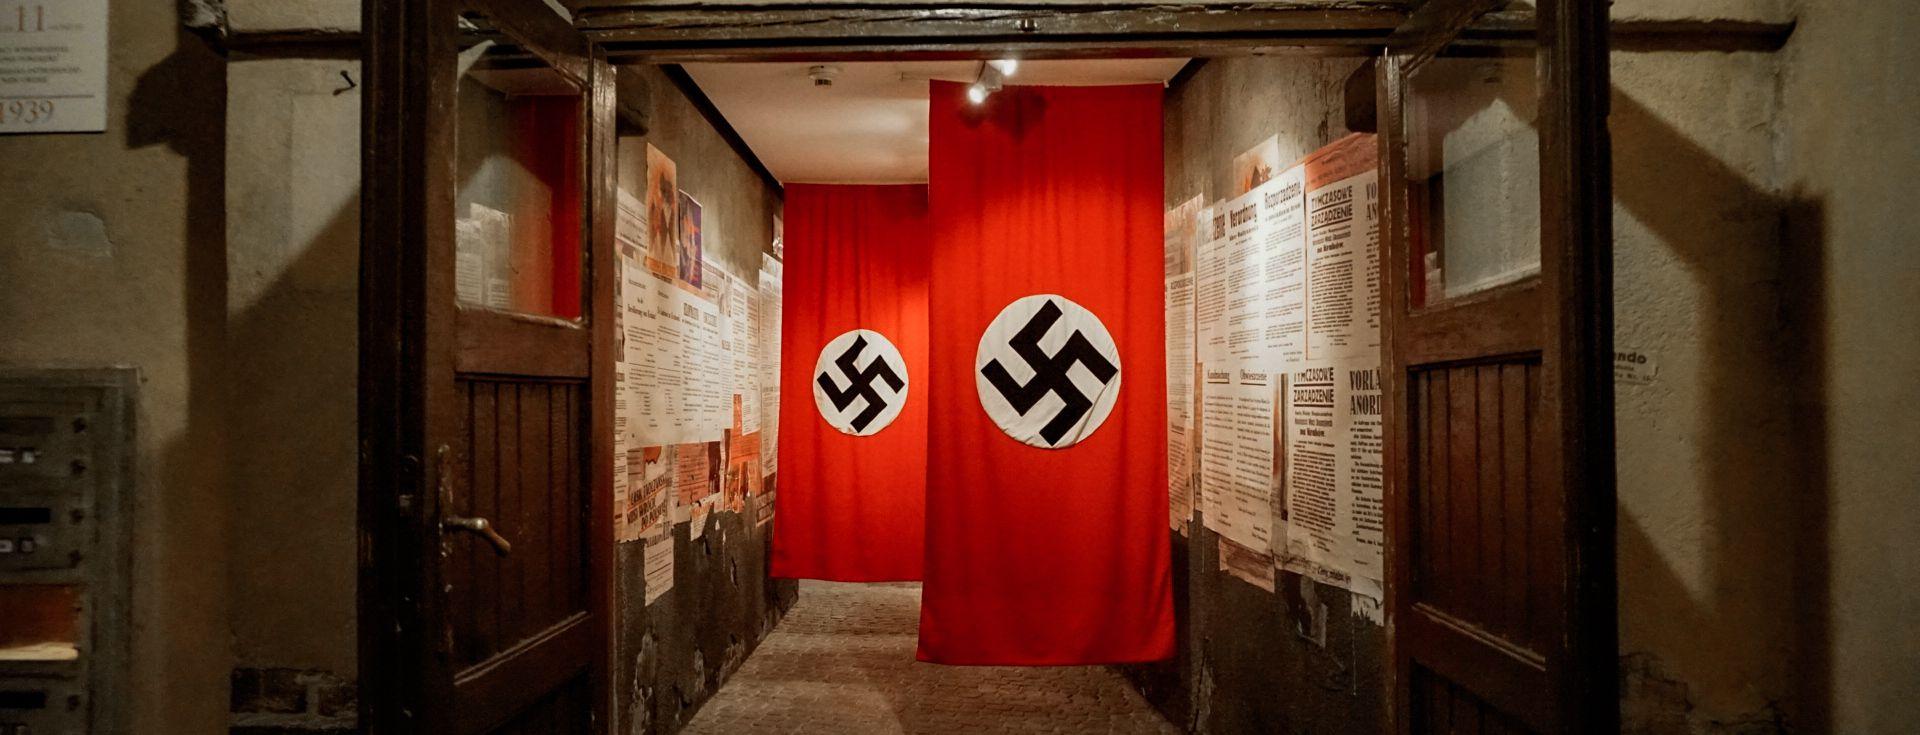 Schindler Tour from Krakow